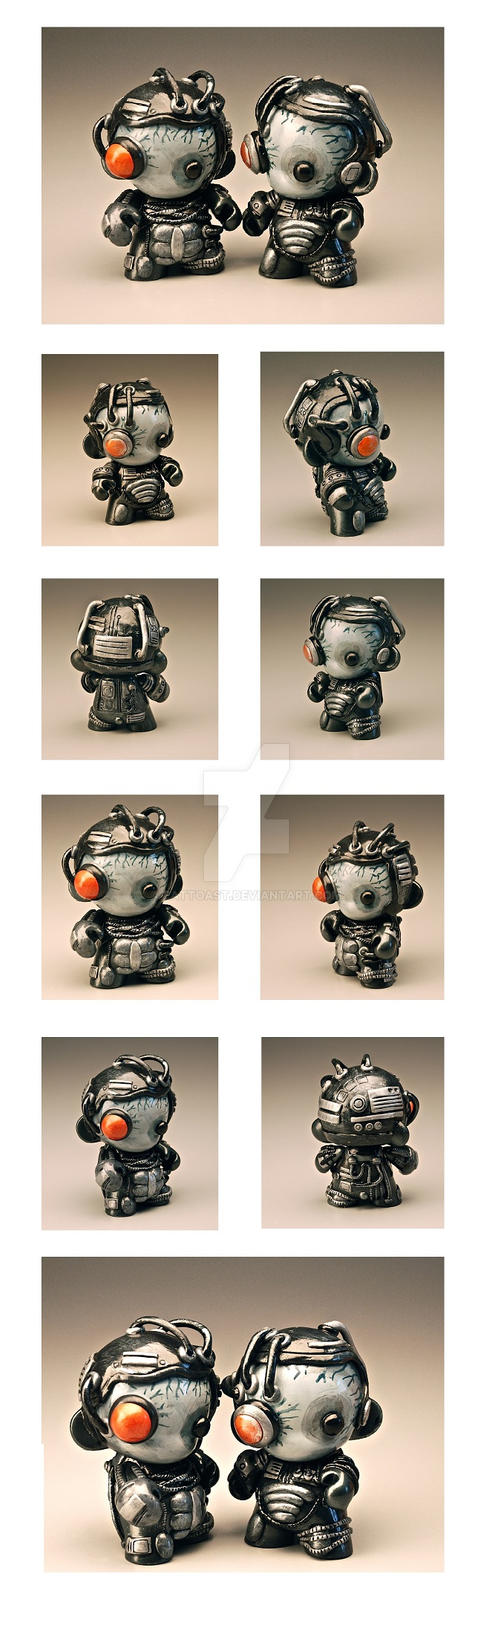 Borg Munnys by EatToast